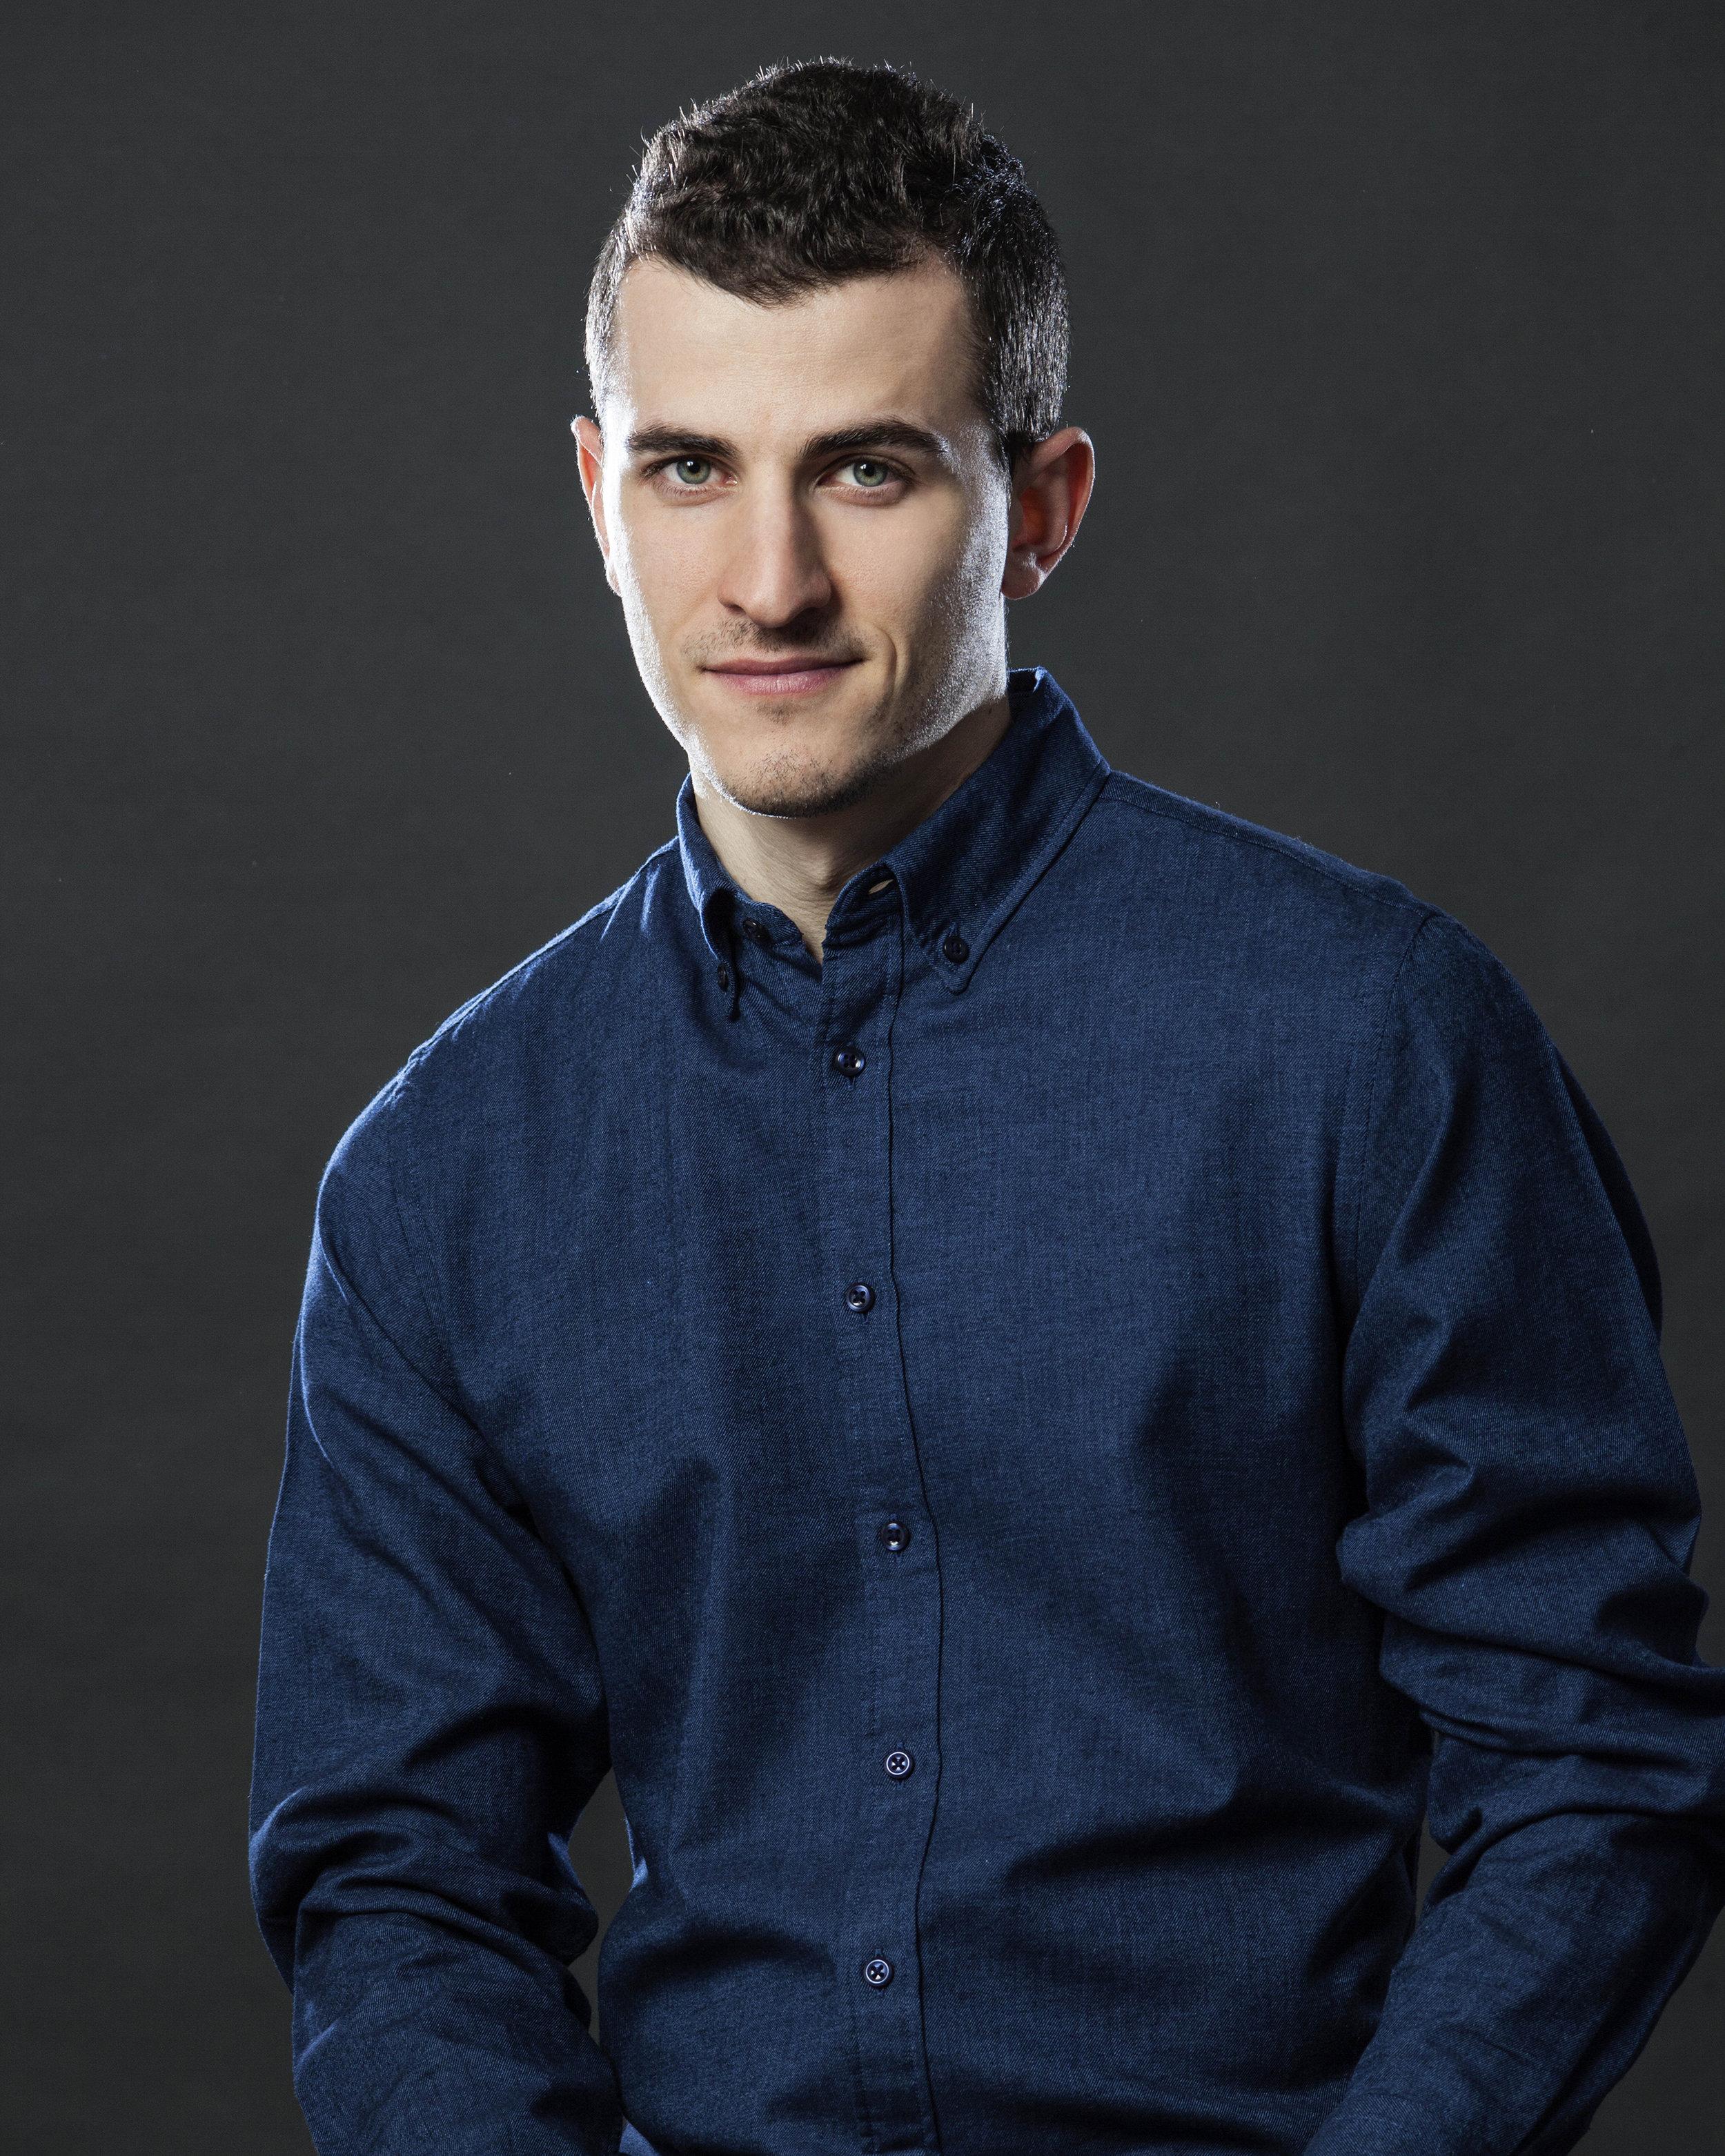 MatteoMeraldi_Profile